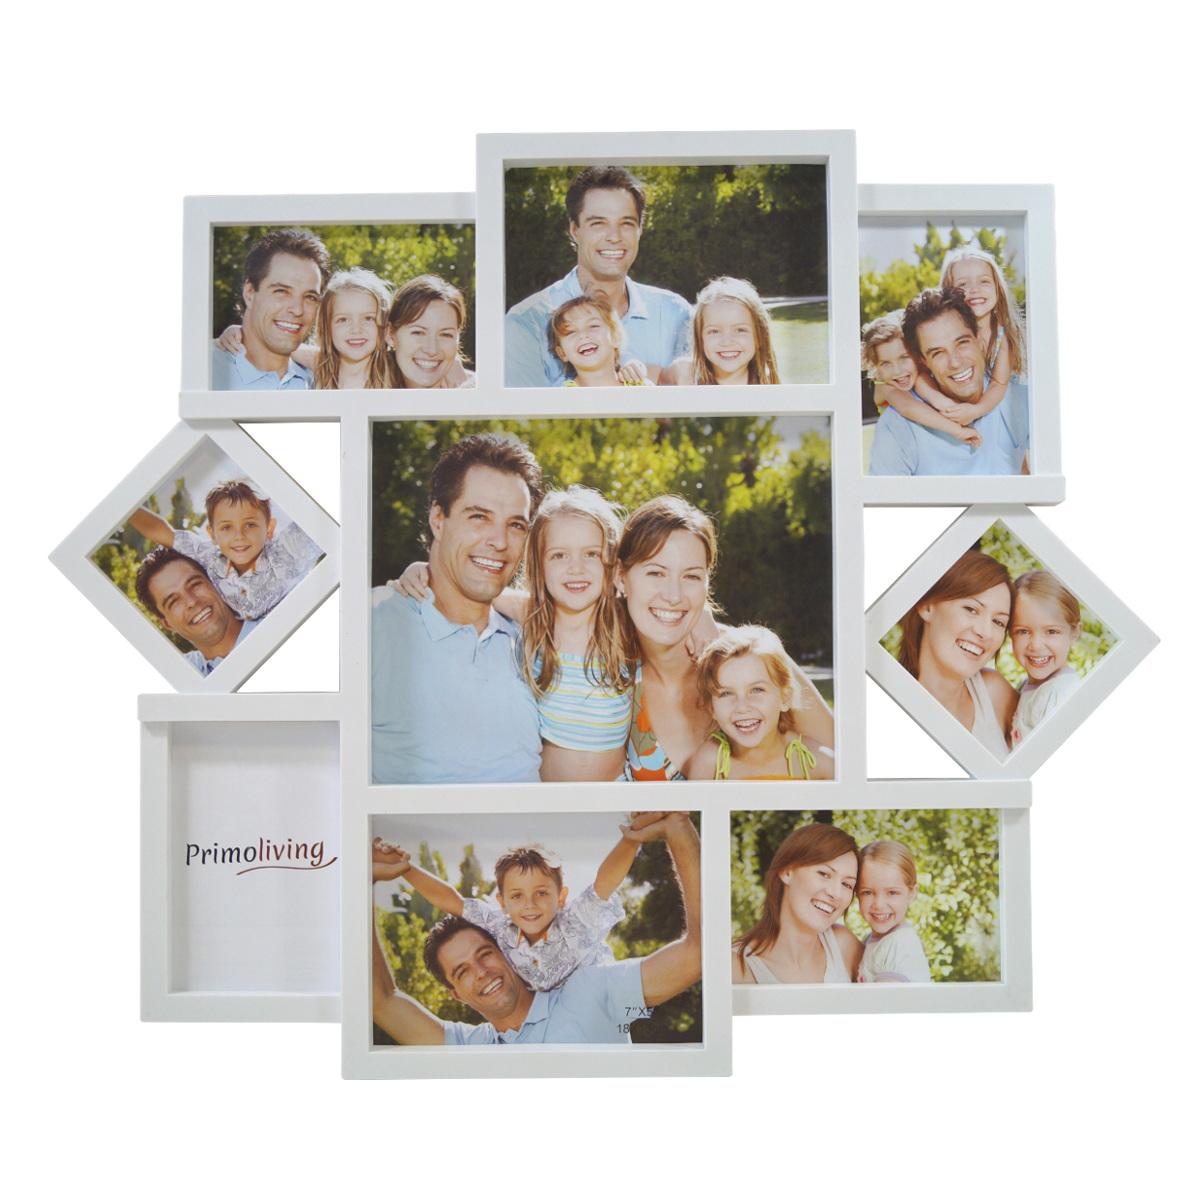 bildergalerie fotogalerie fotorahmen bilderrahmen collage family love herz wei ebay. Black Bedroom Furniture Sets. Home Design Ideas